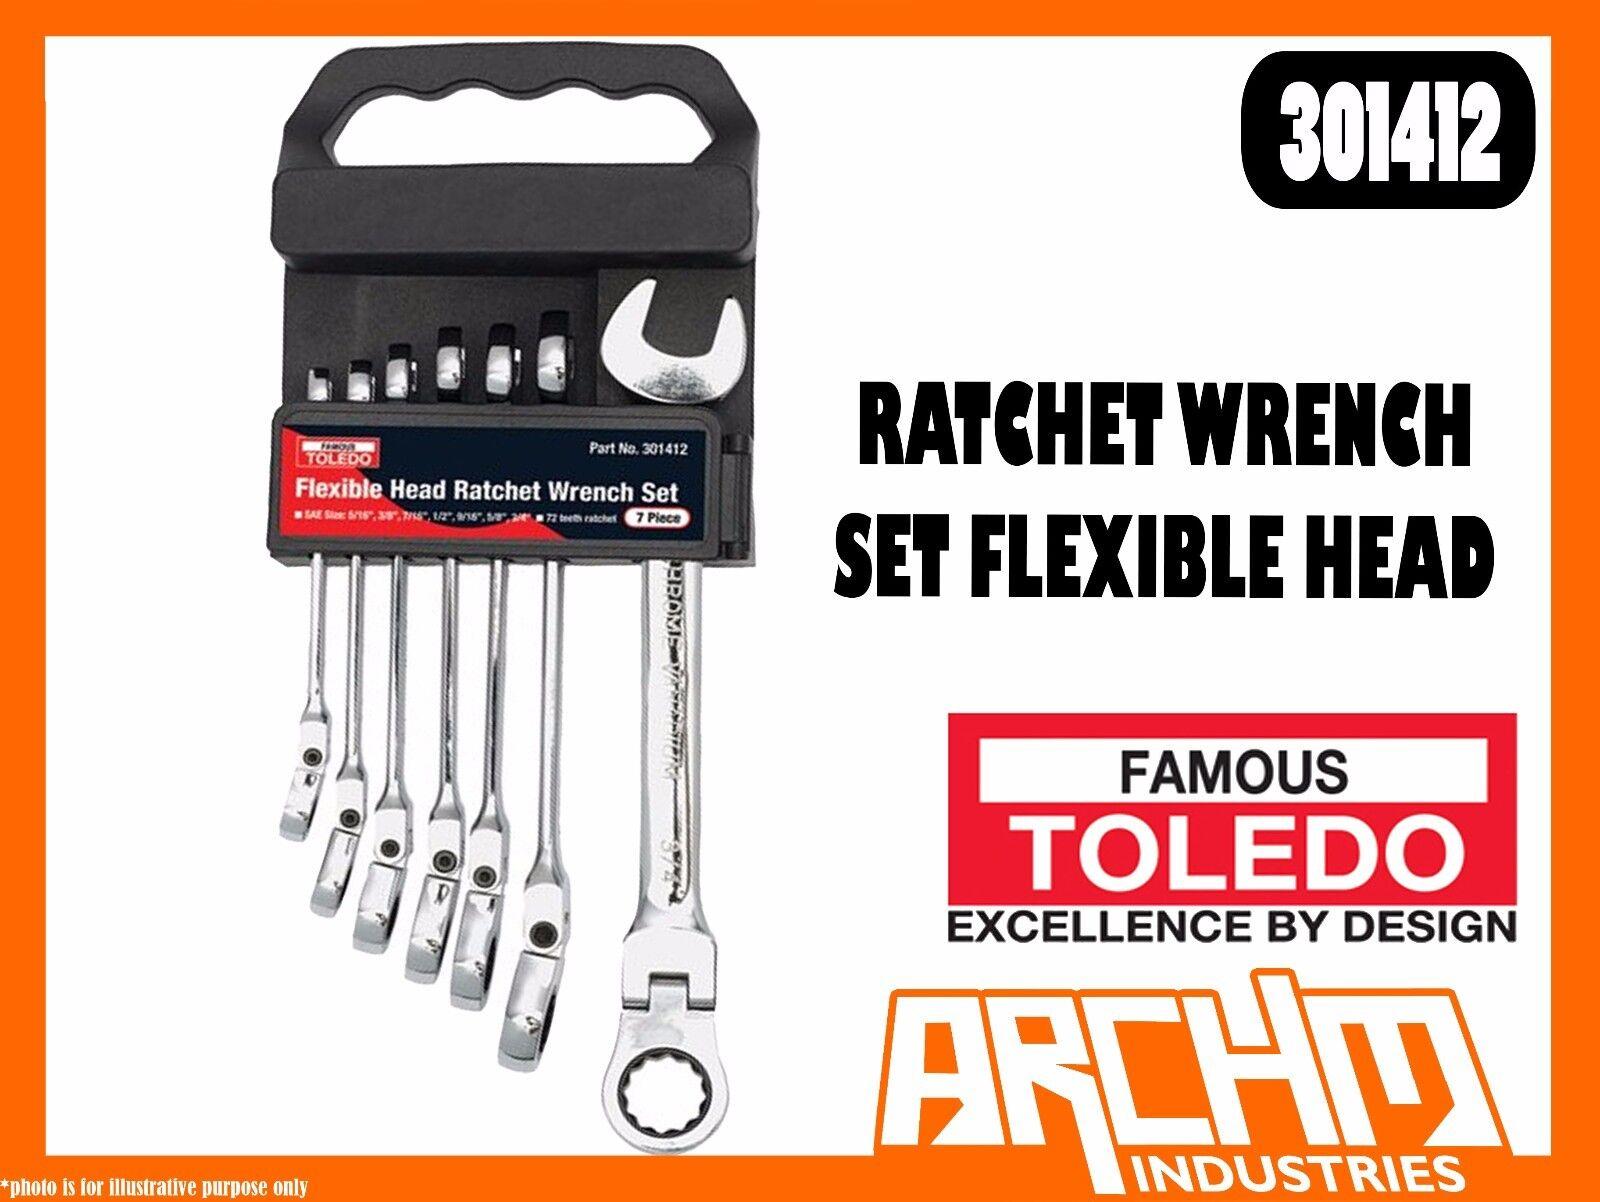 TOLEDO 301412 - RATCHET WRENCH SET FLEXIBLE HEAD - SAE 7 PC 5 16 -3 4  RING OPEN